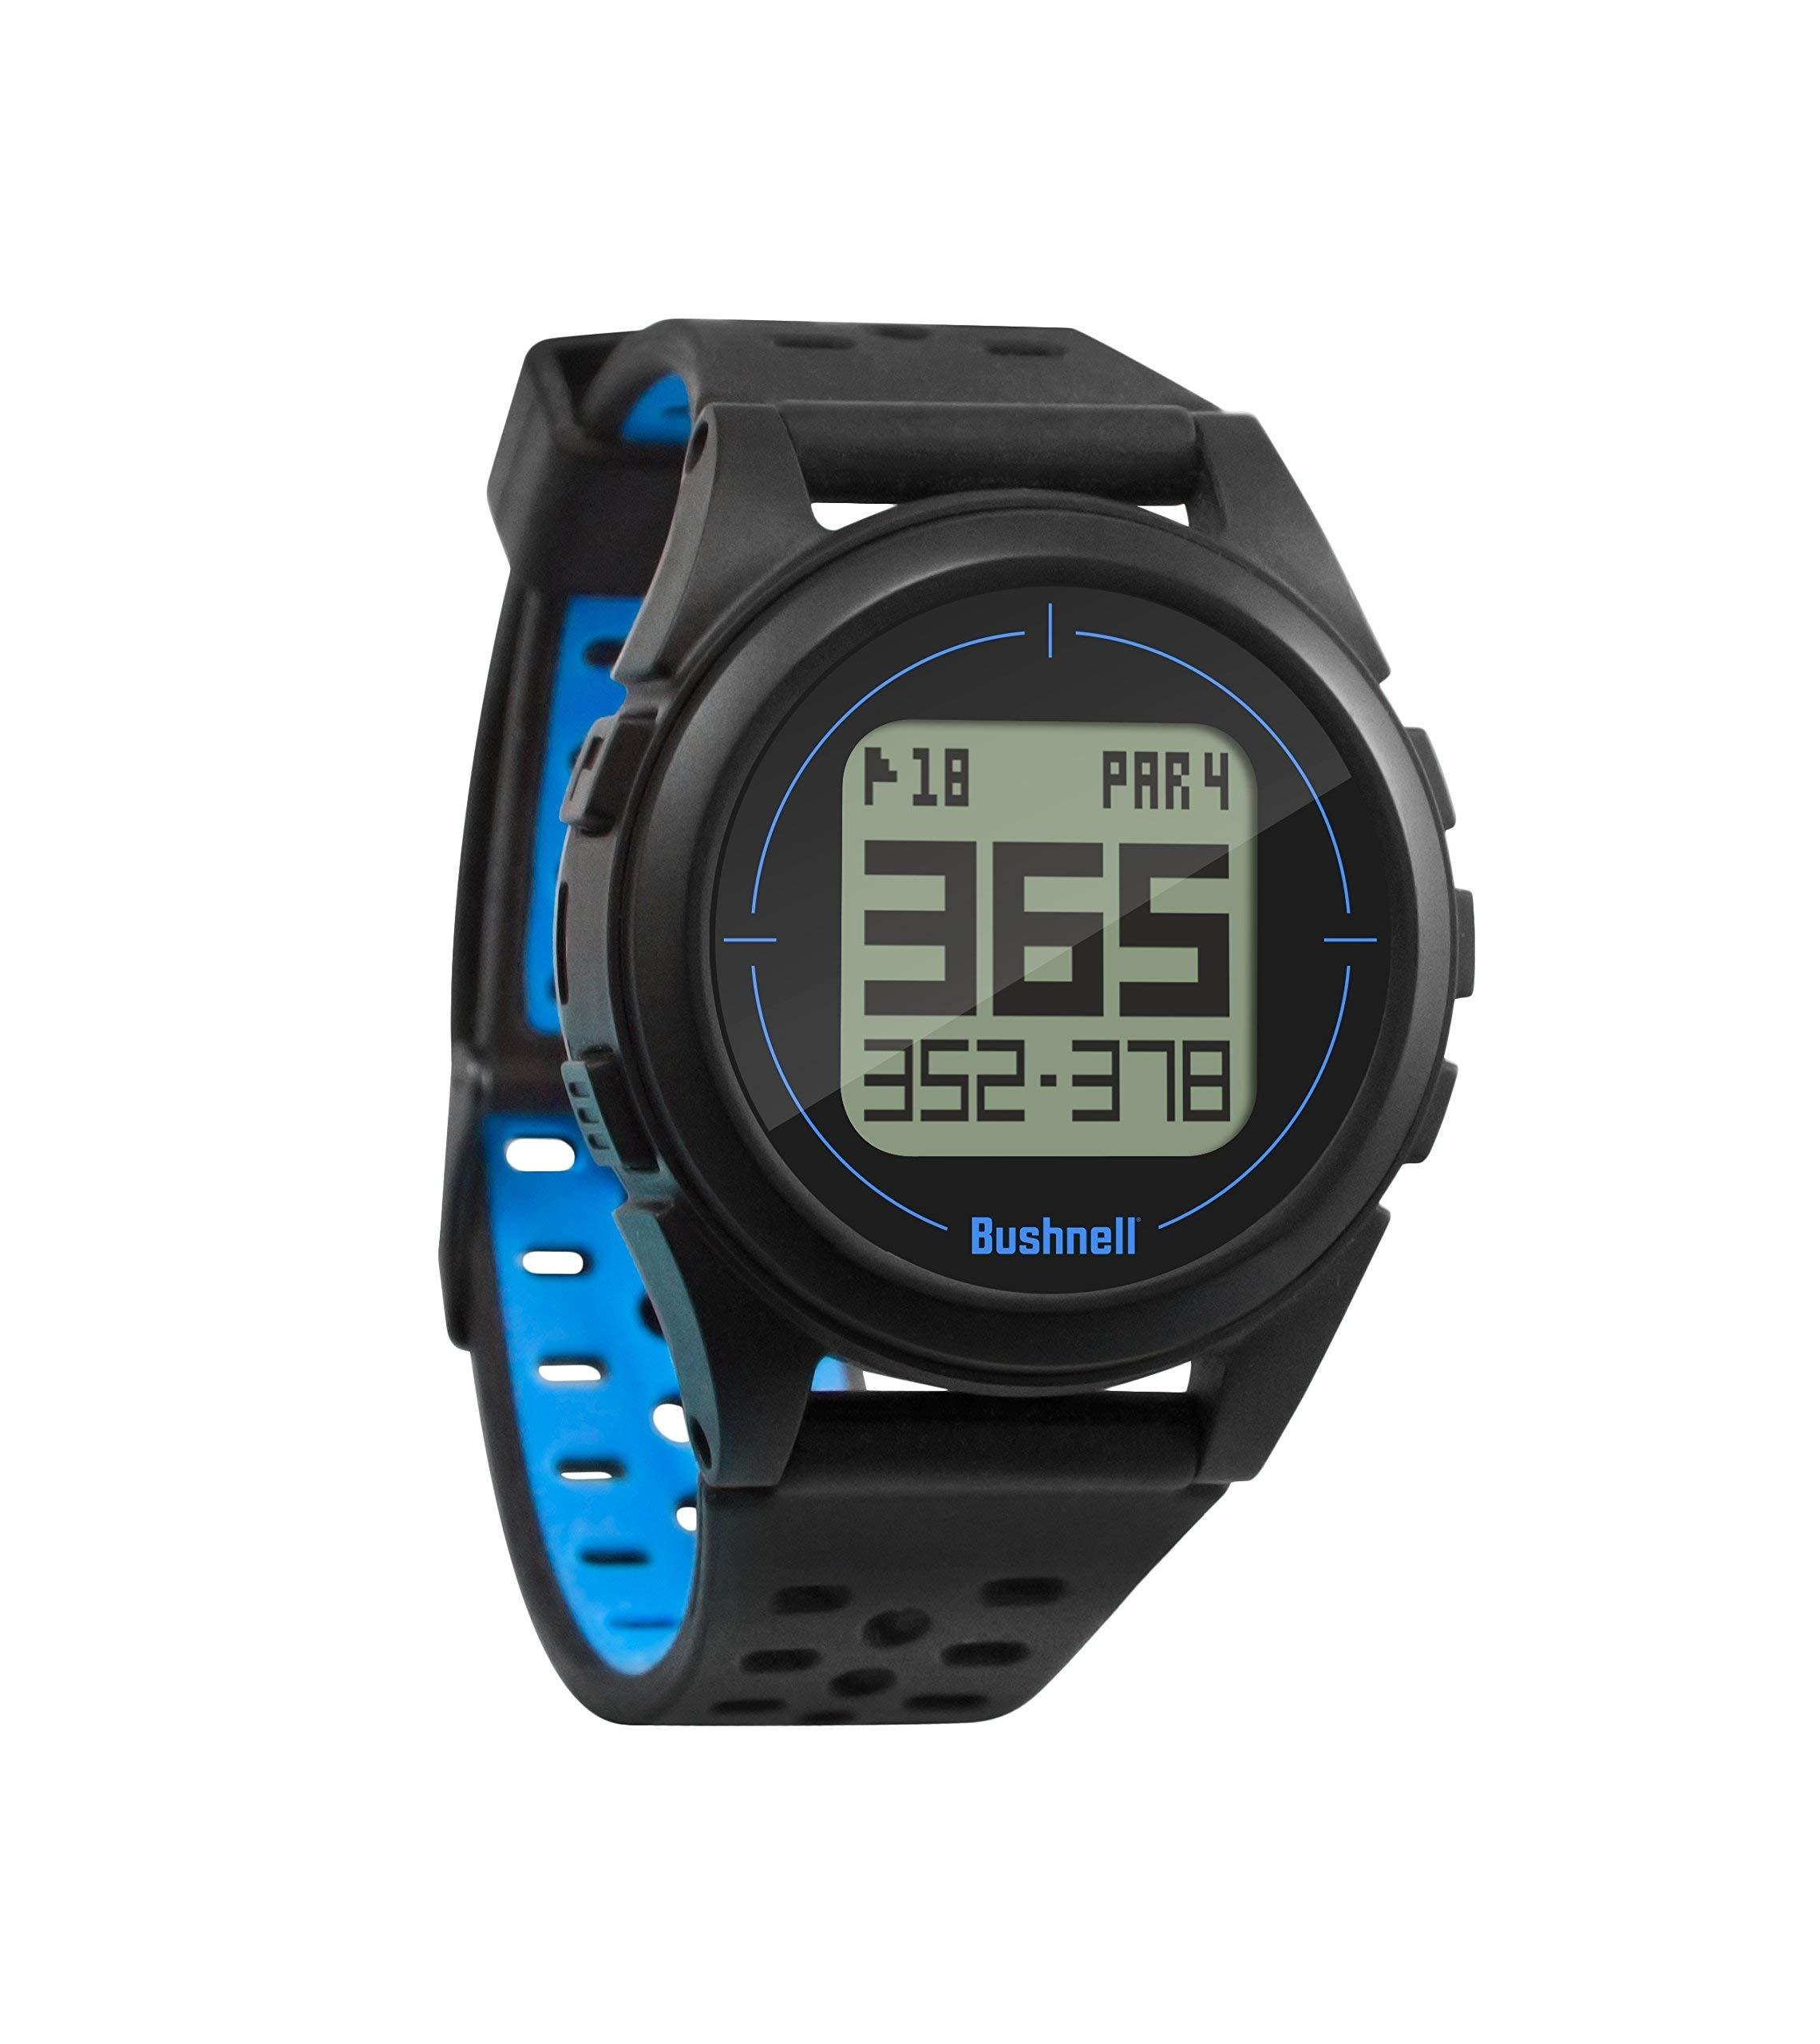 Bushnell Neo Ion 2 Golf GPS Watch, Black/Blue (Renewed)